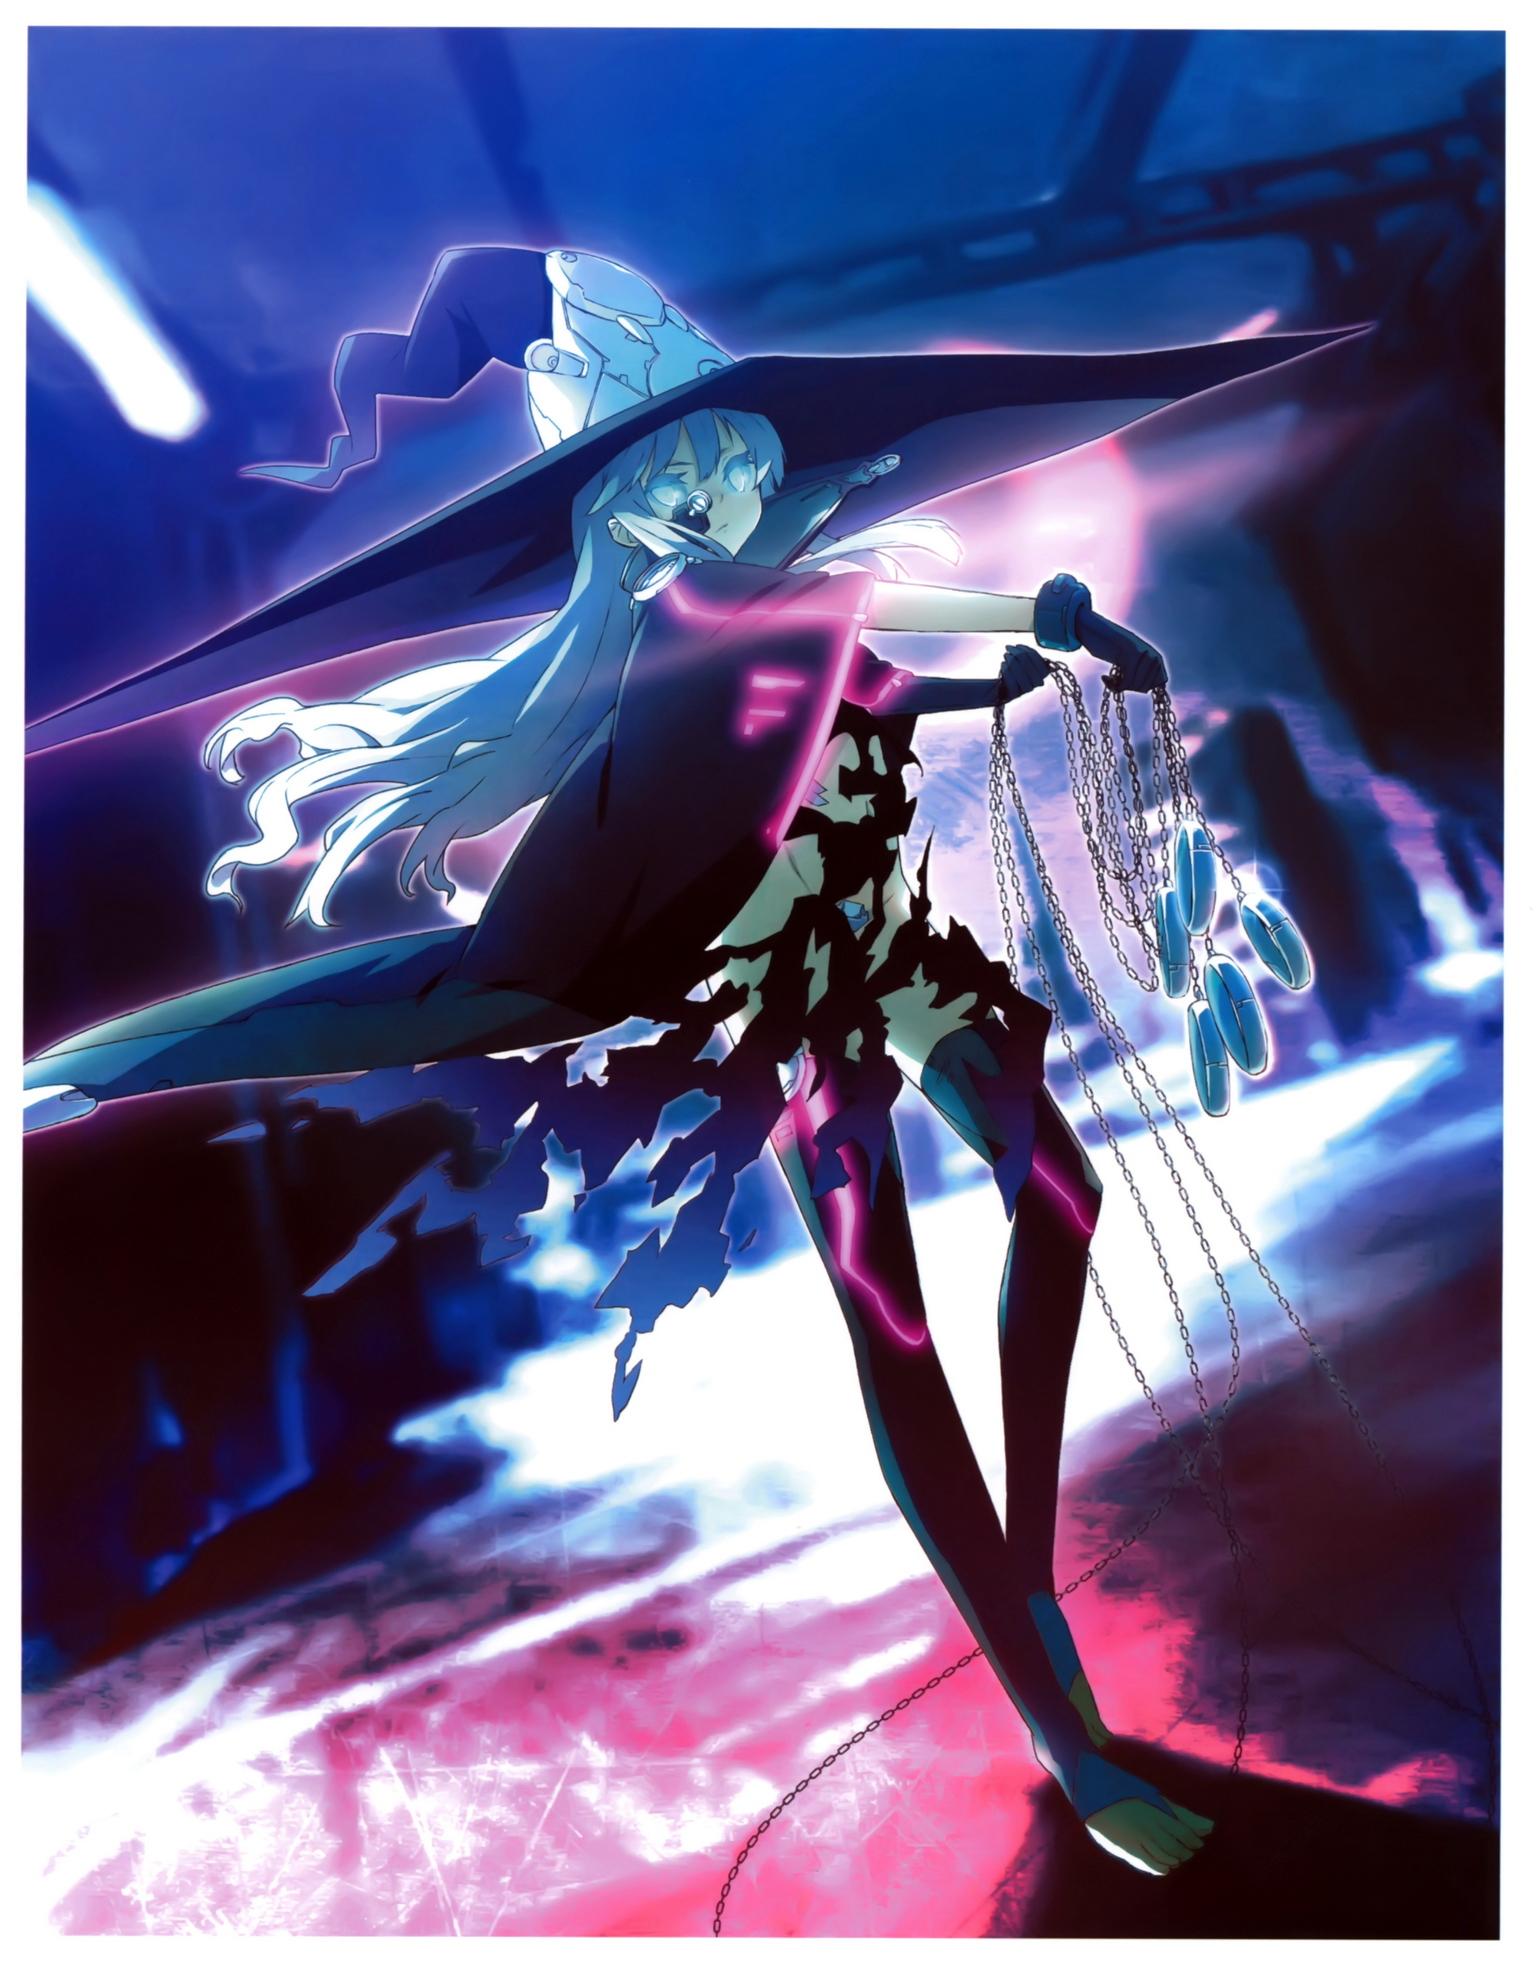 Ipad Anime Wallpapers Wallpapersafari